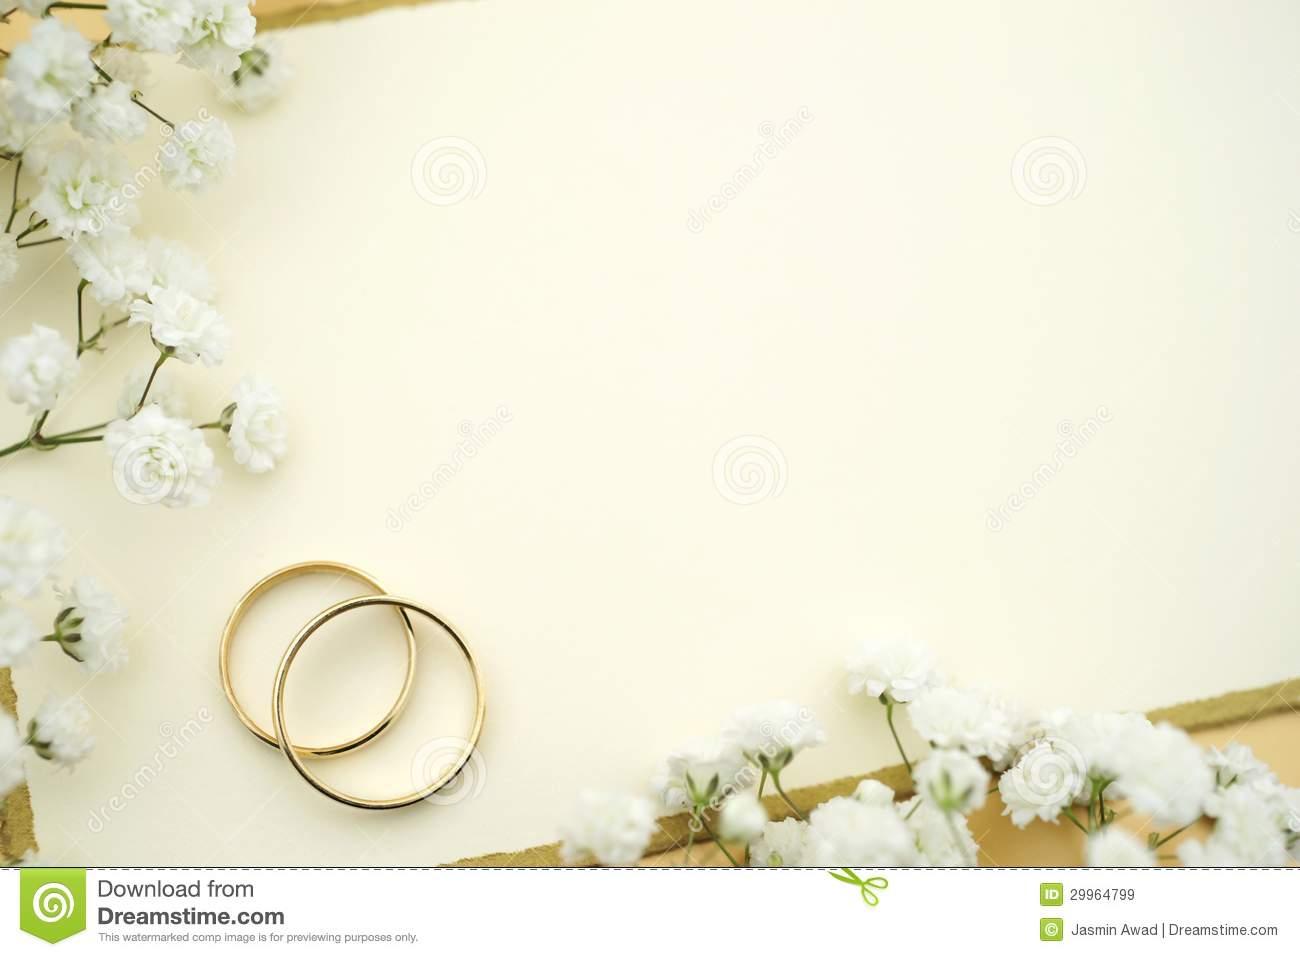 Wedding Invite Stock Image  Image Of Jewelry, Wedding